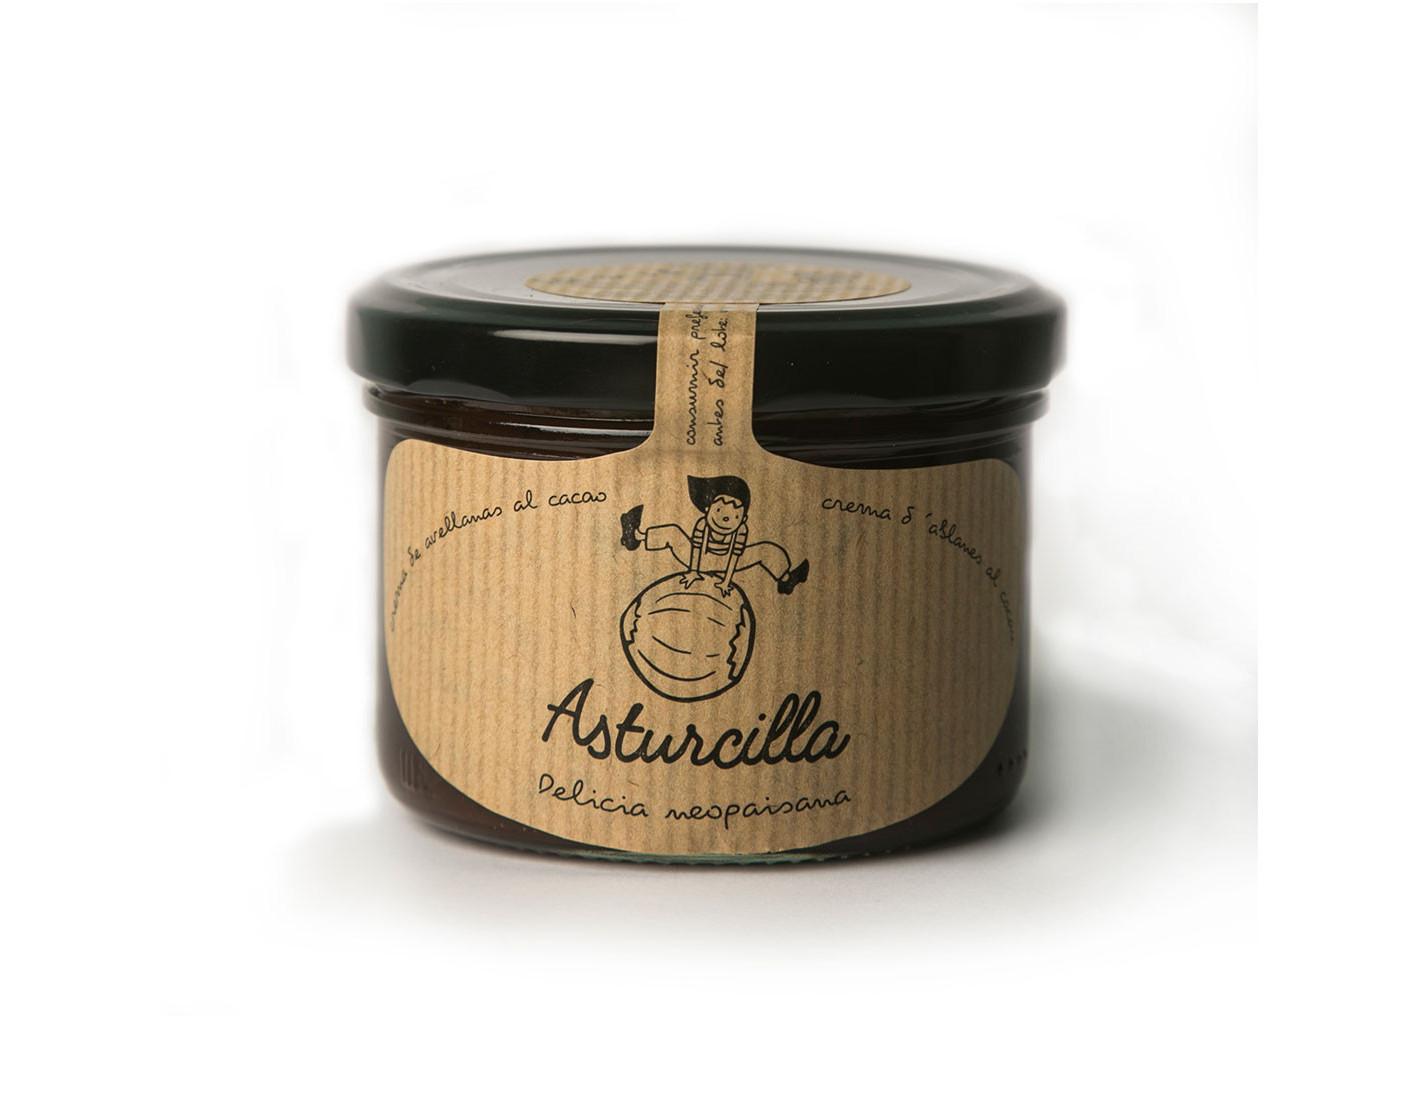 Asturcilla Delicia Neopaisana 230 g